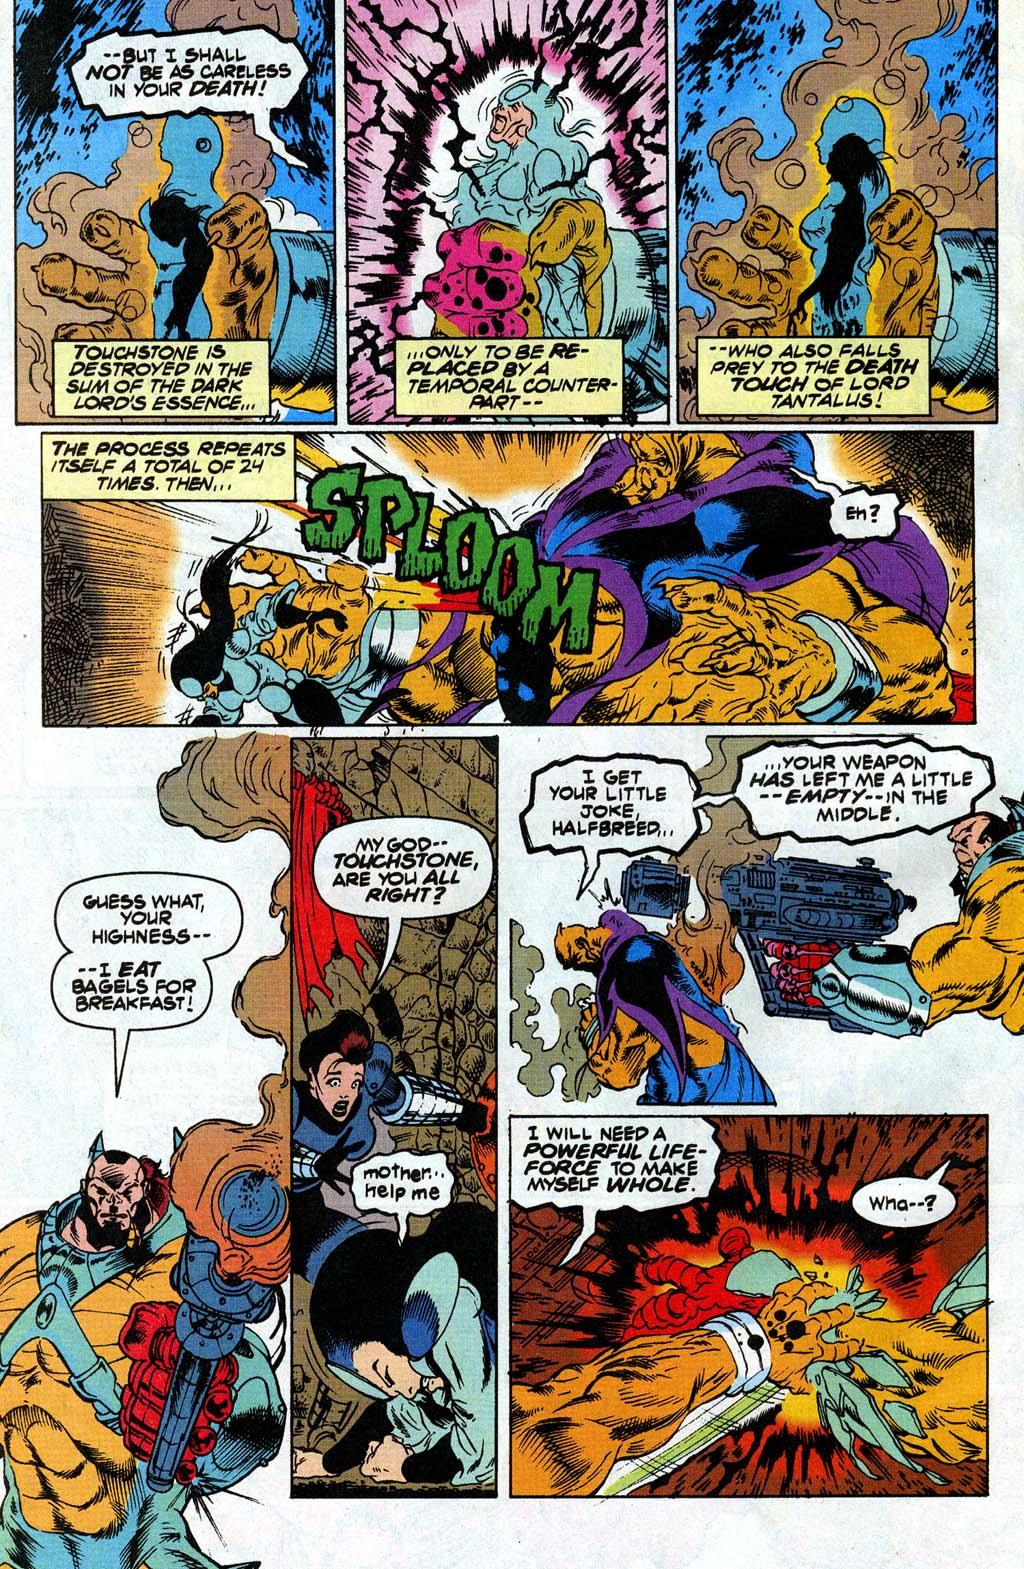 Read online Blackwulf comic -  Issue #10 - 11